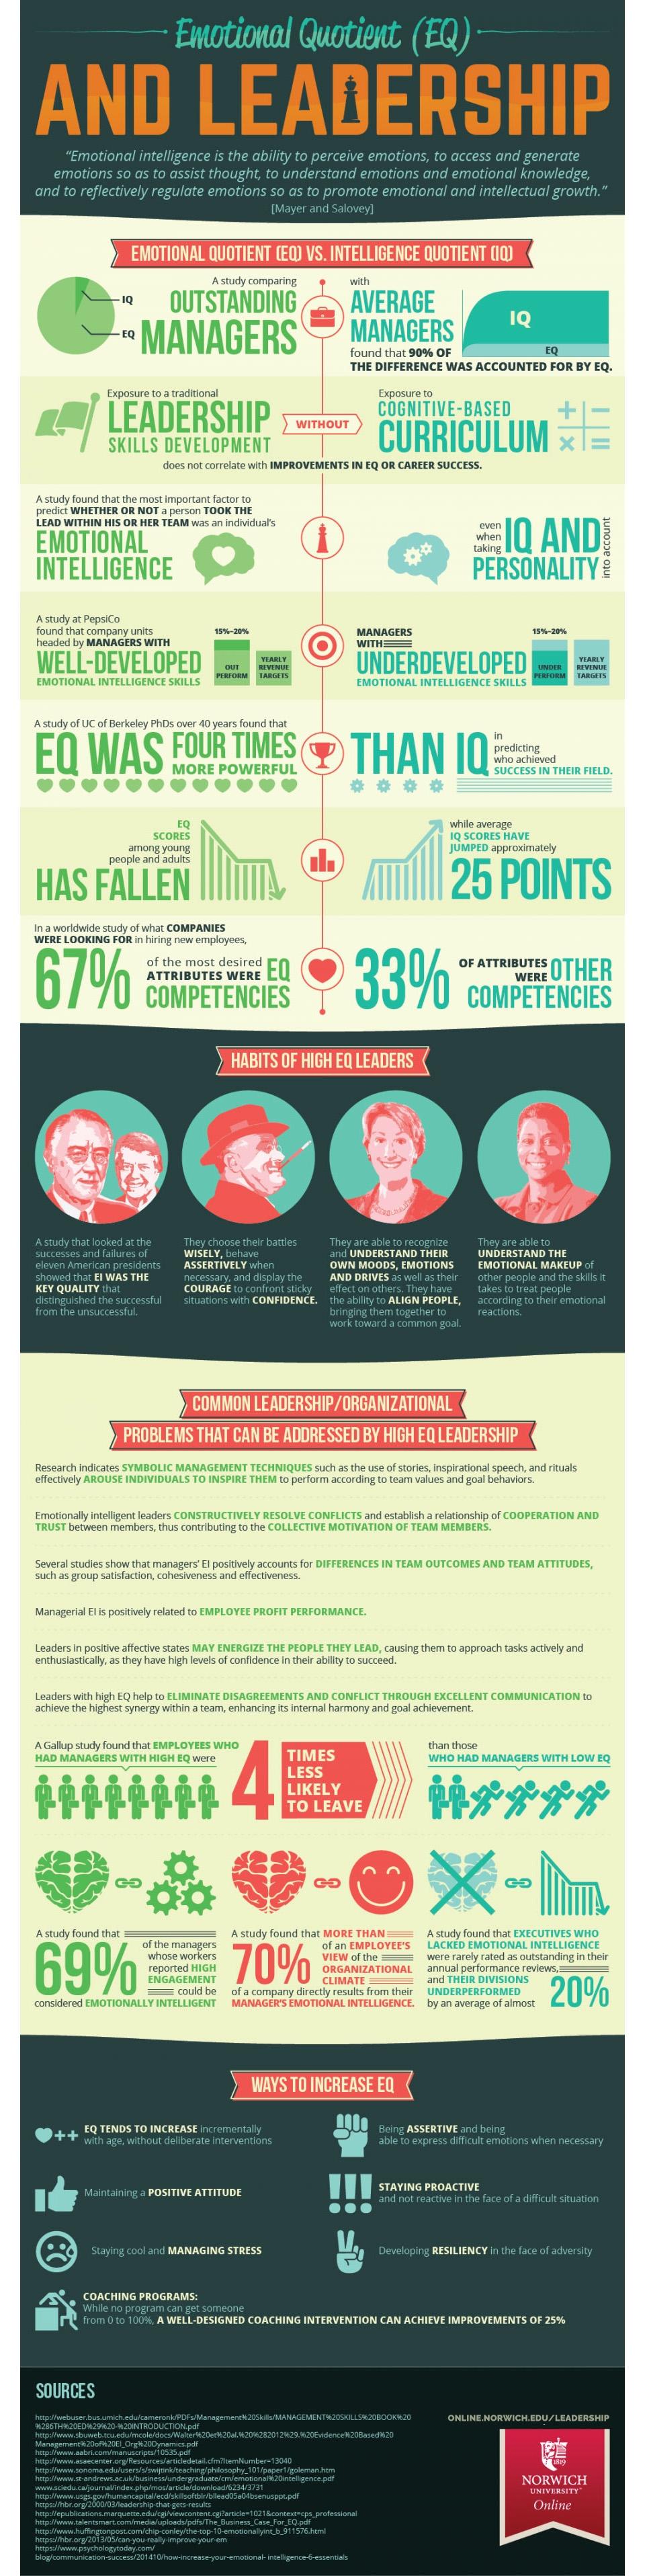 emotional quotient infographic image